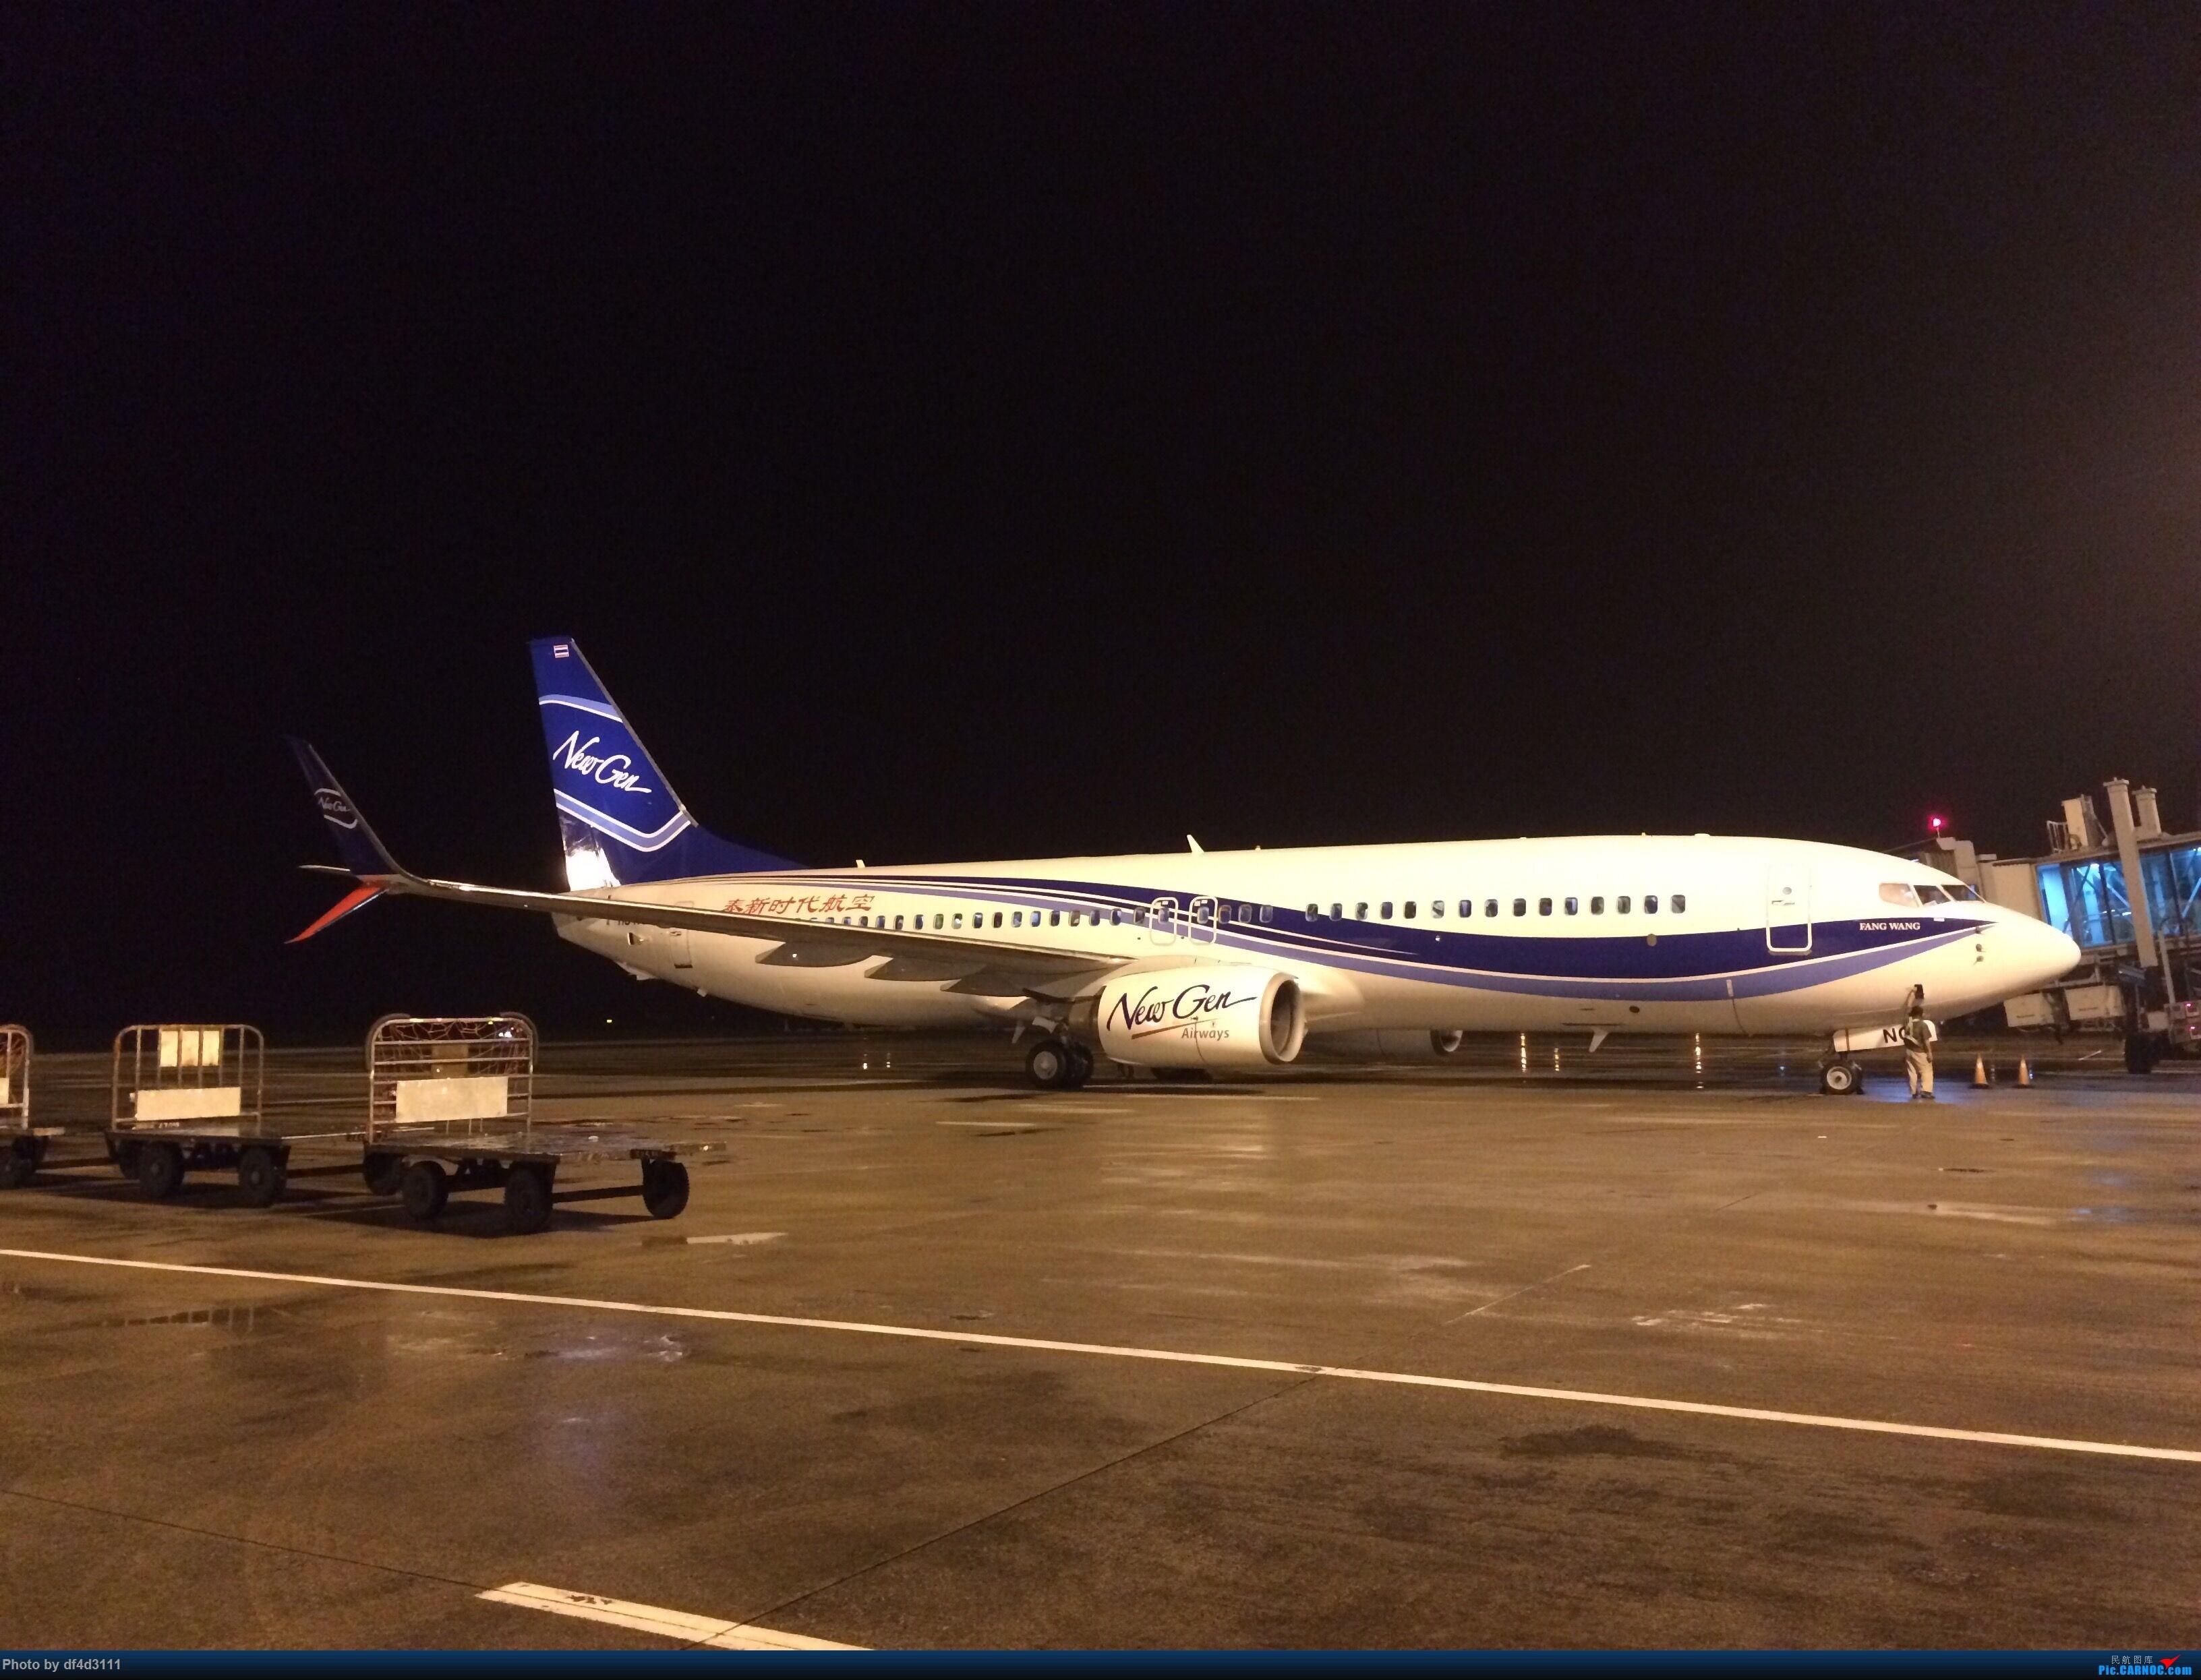 re:re:re:re:[原创]737 max 8国内首降~ 中国桂林两江国际机场图片